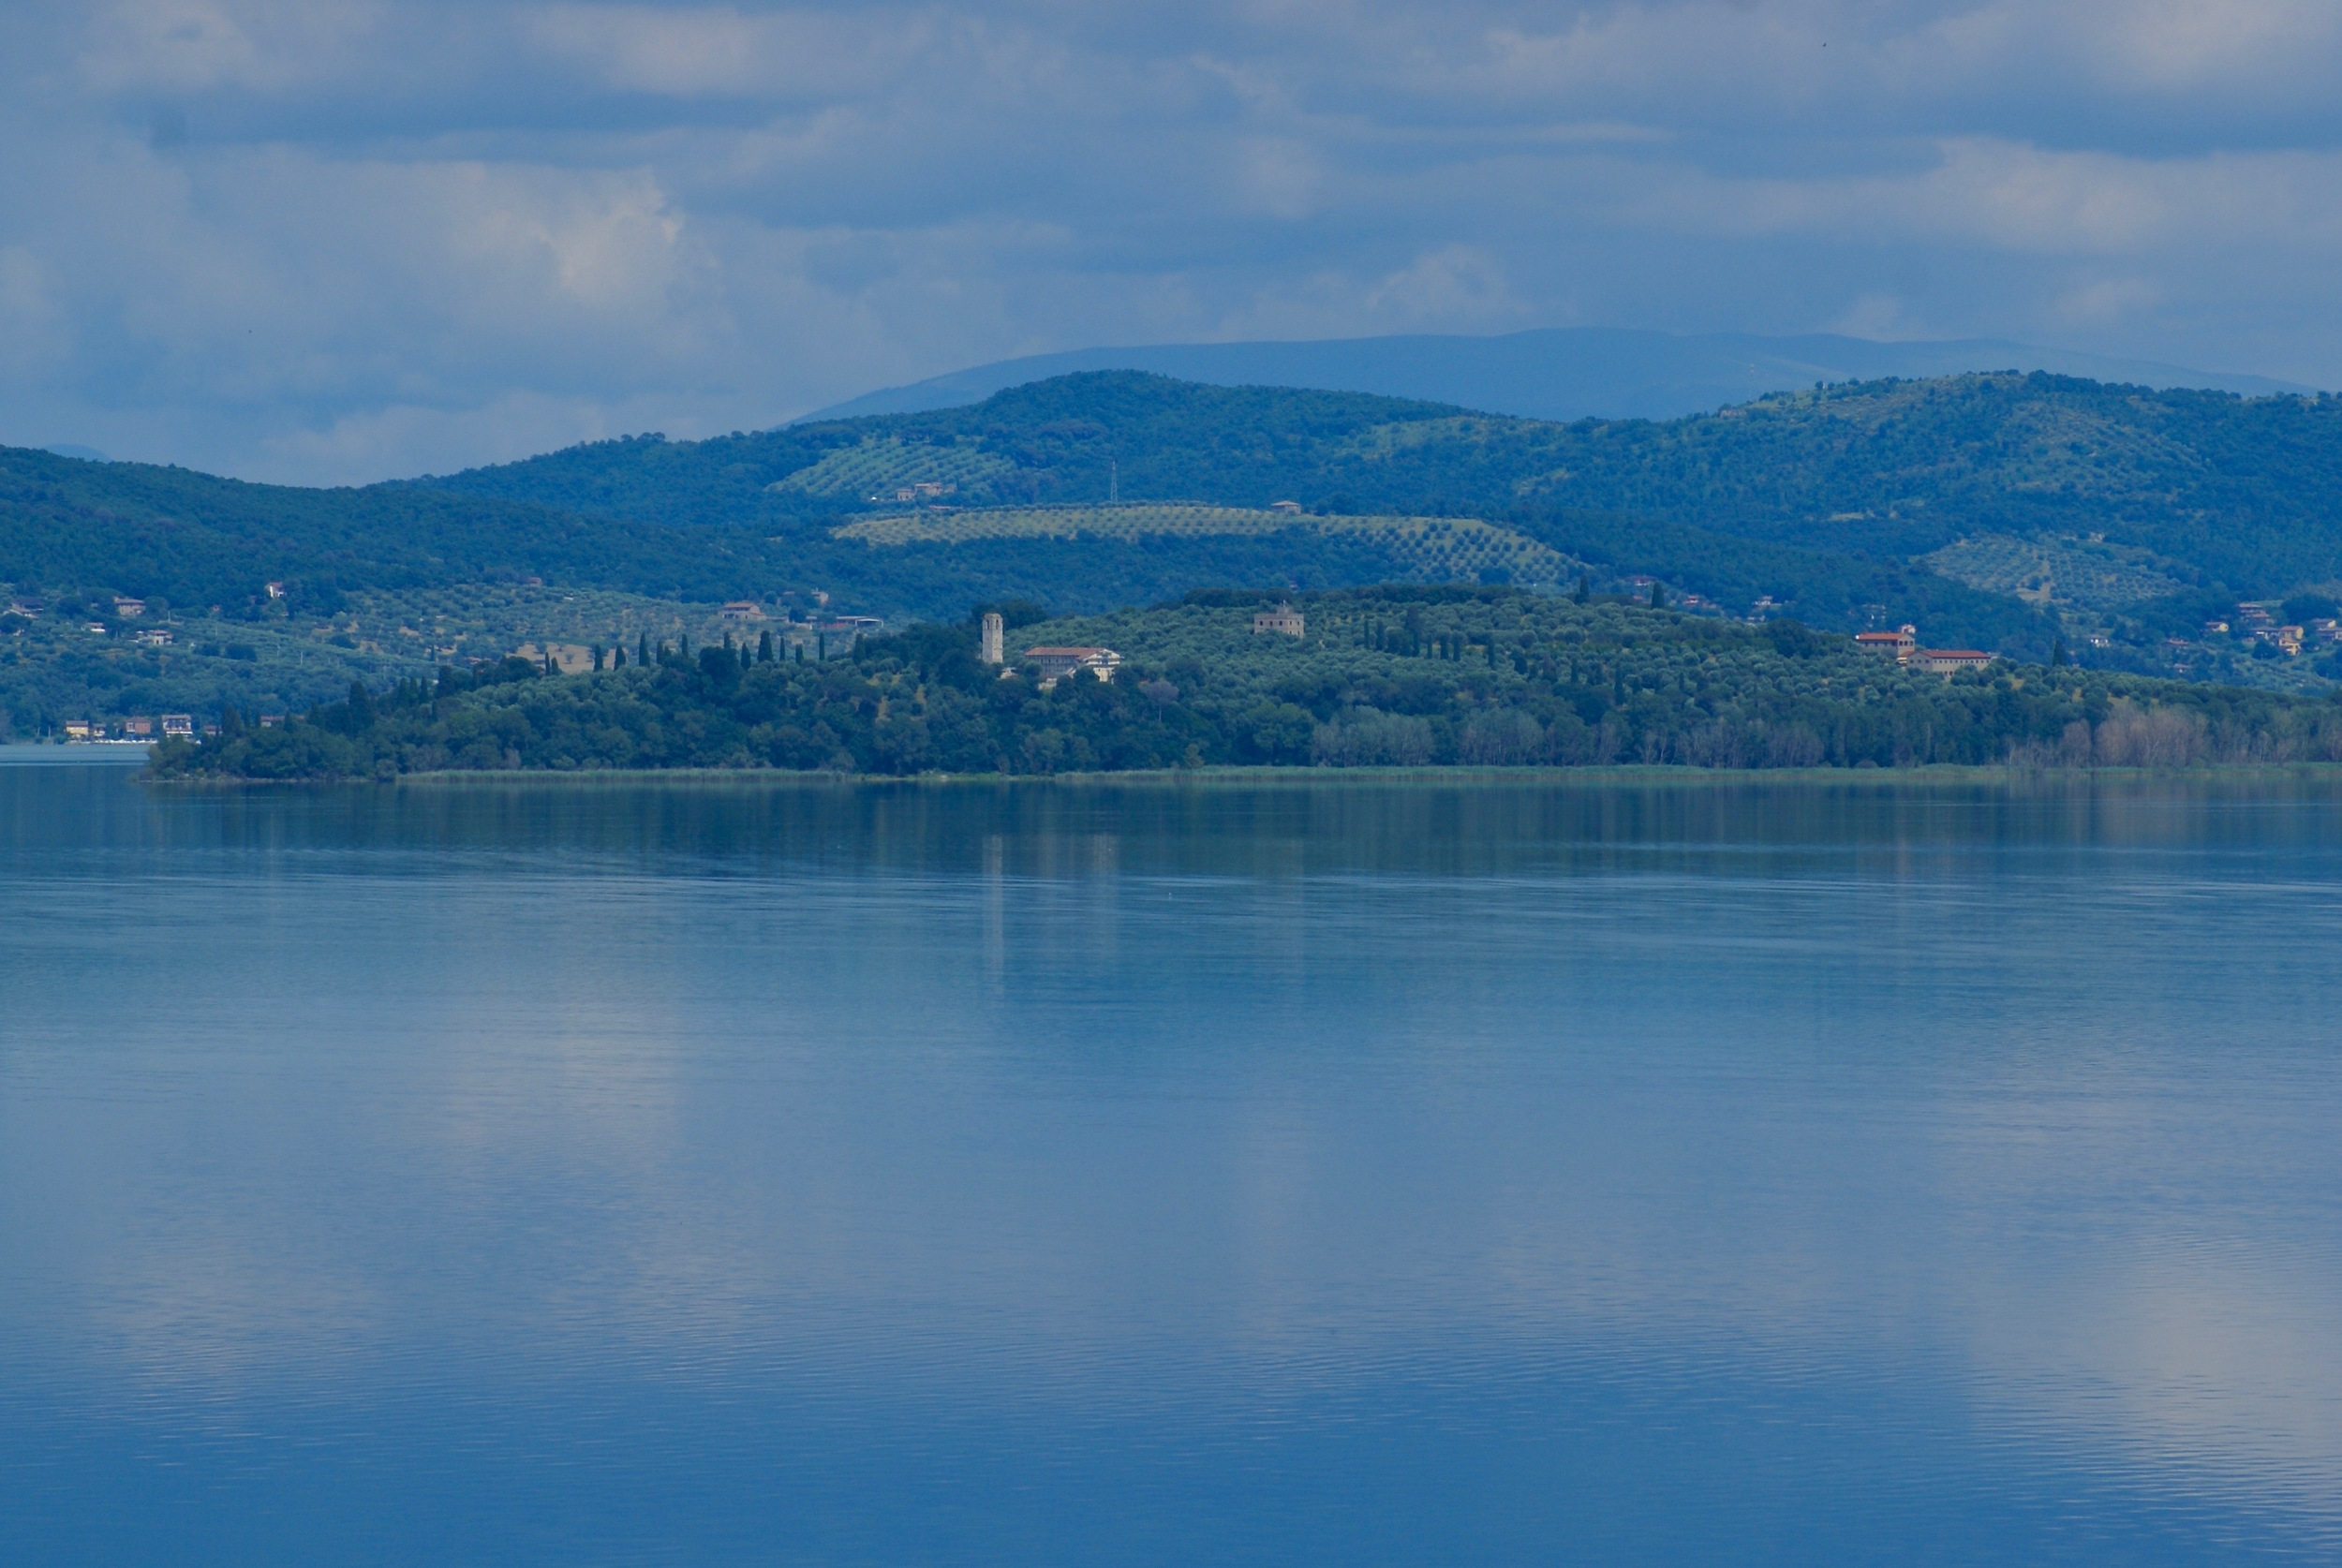 Lake Trasimeno from La Cantina